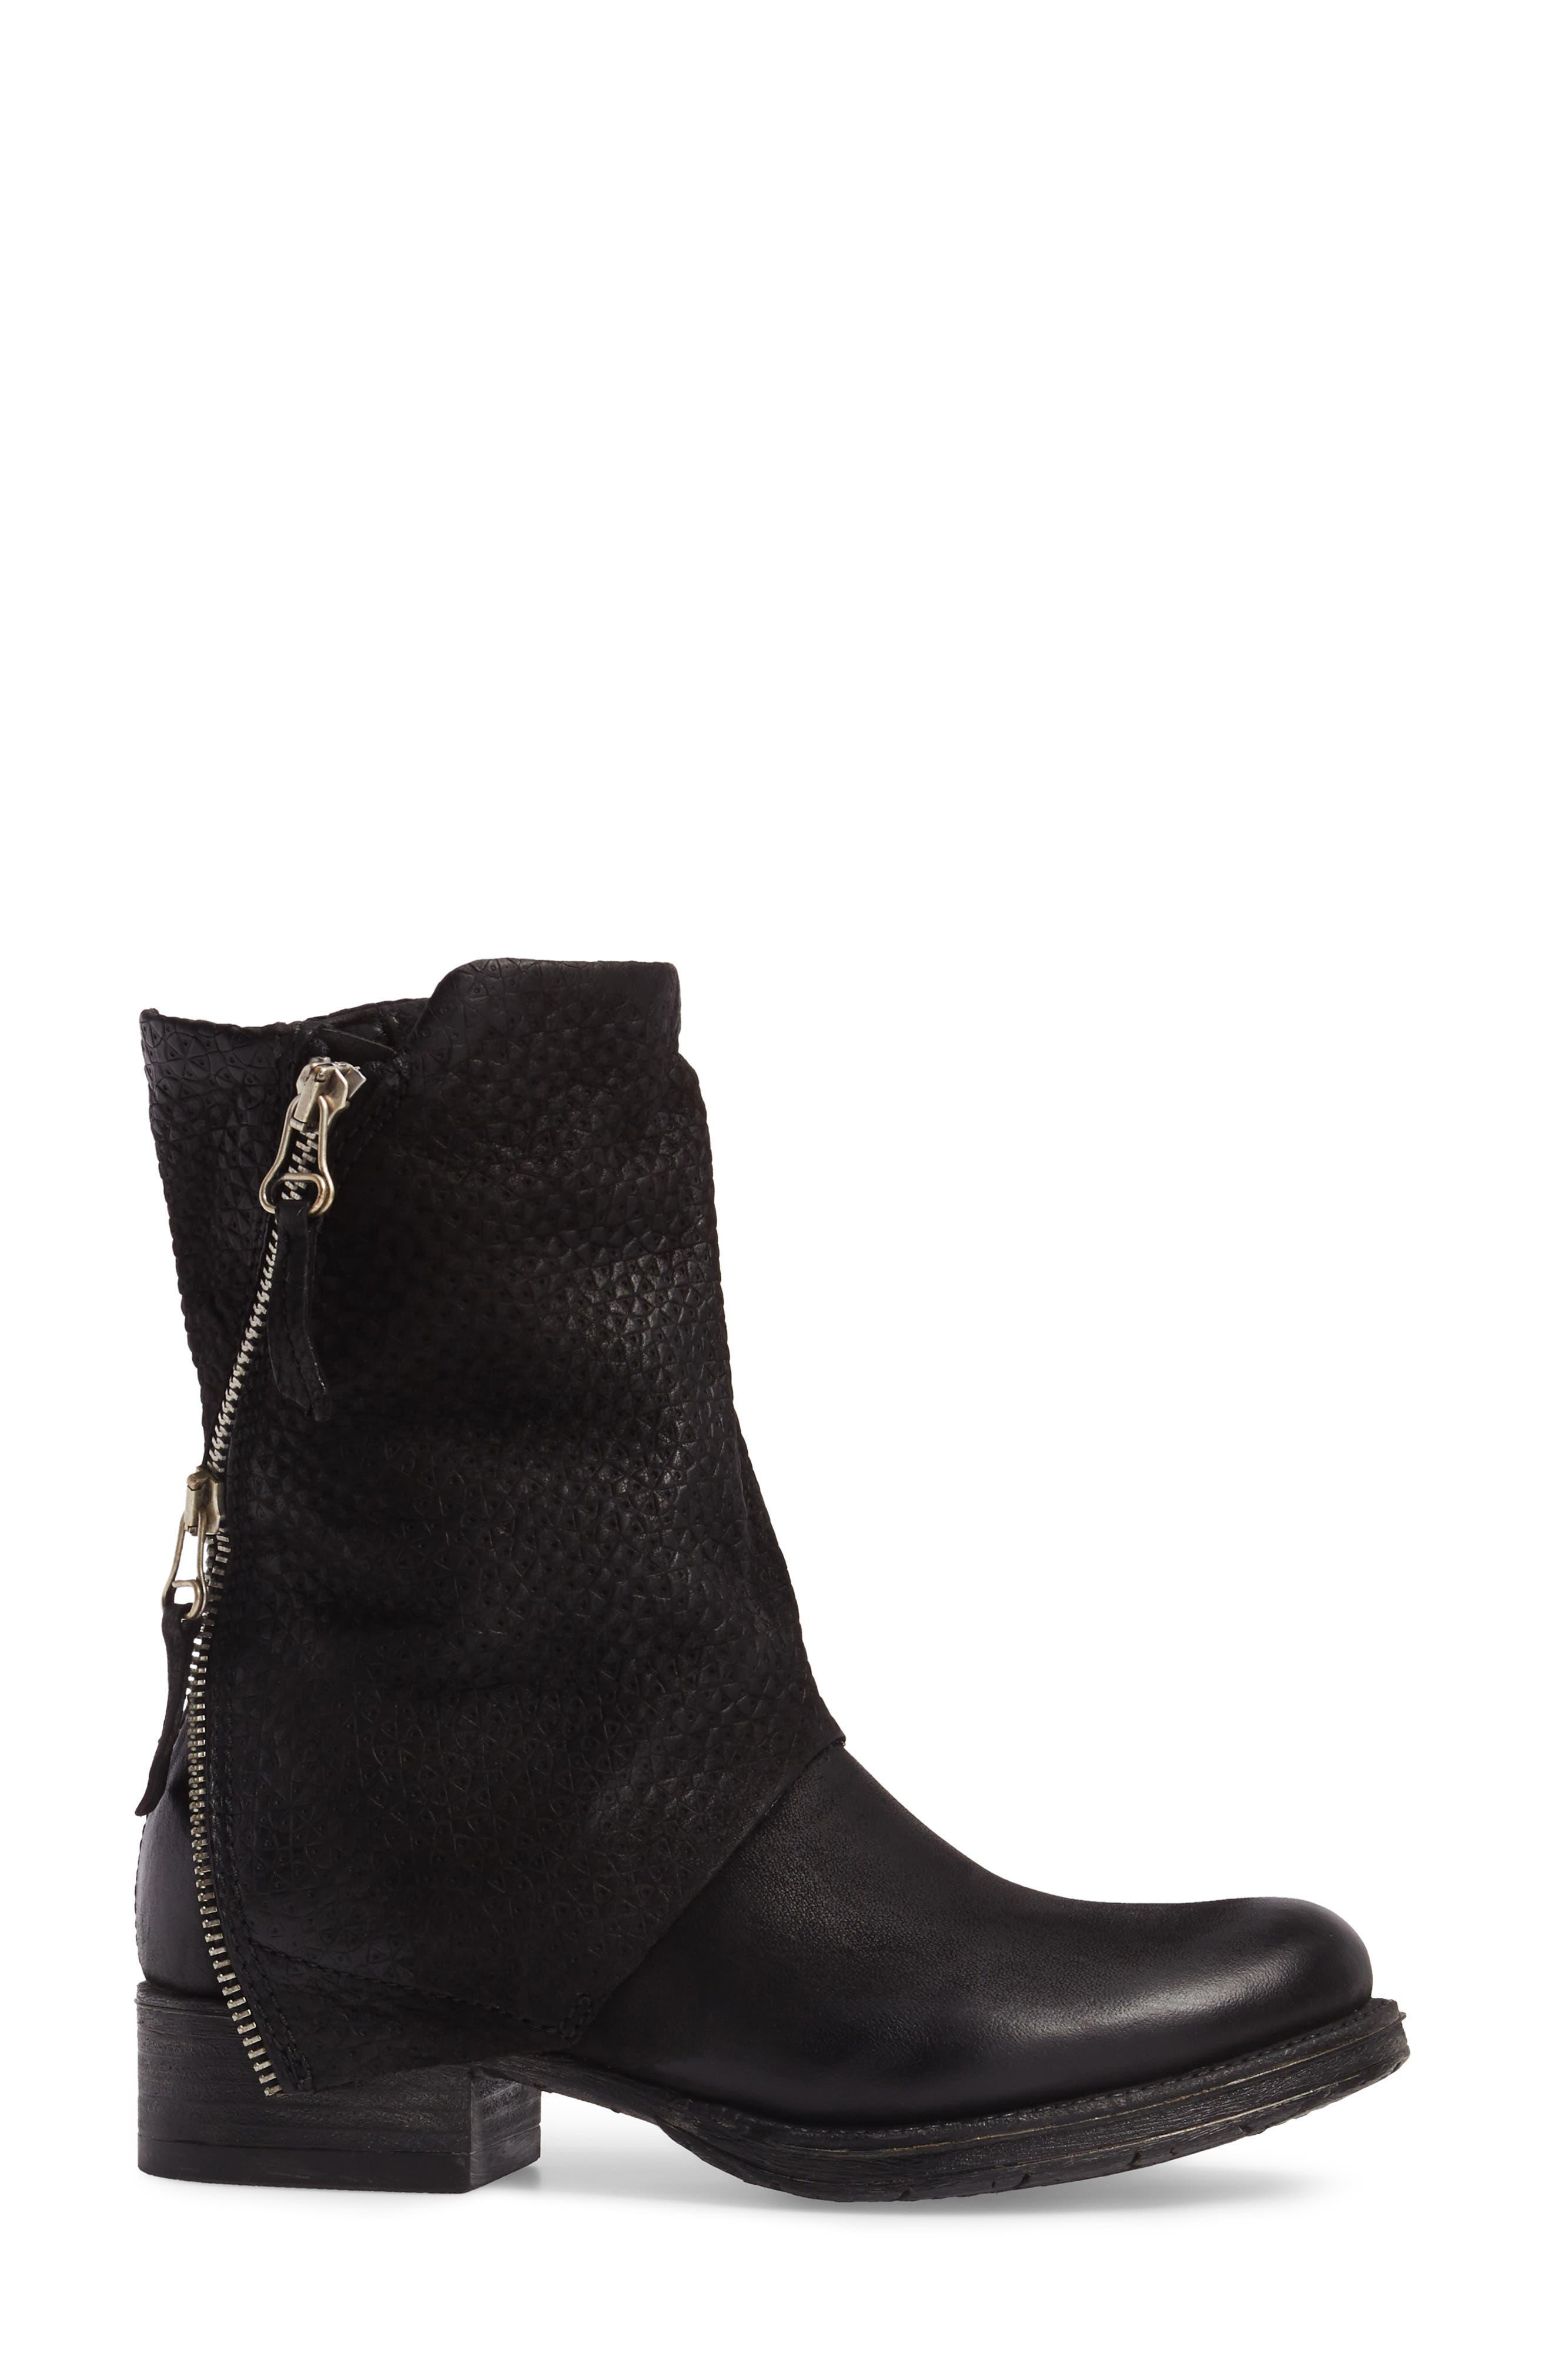 Alternate Image 3  - Miz Mooz Nugget Asymmetrical Textured Boot (Women)